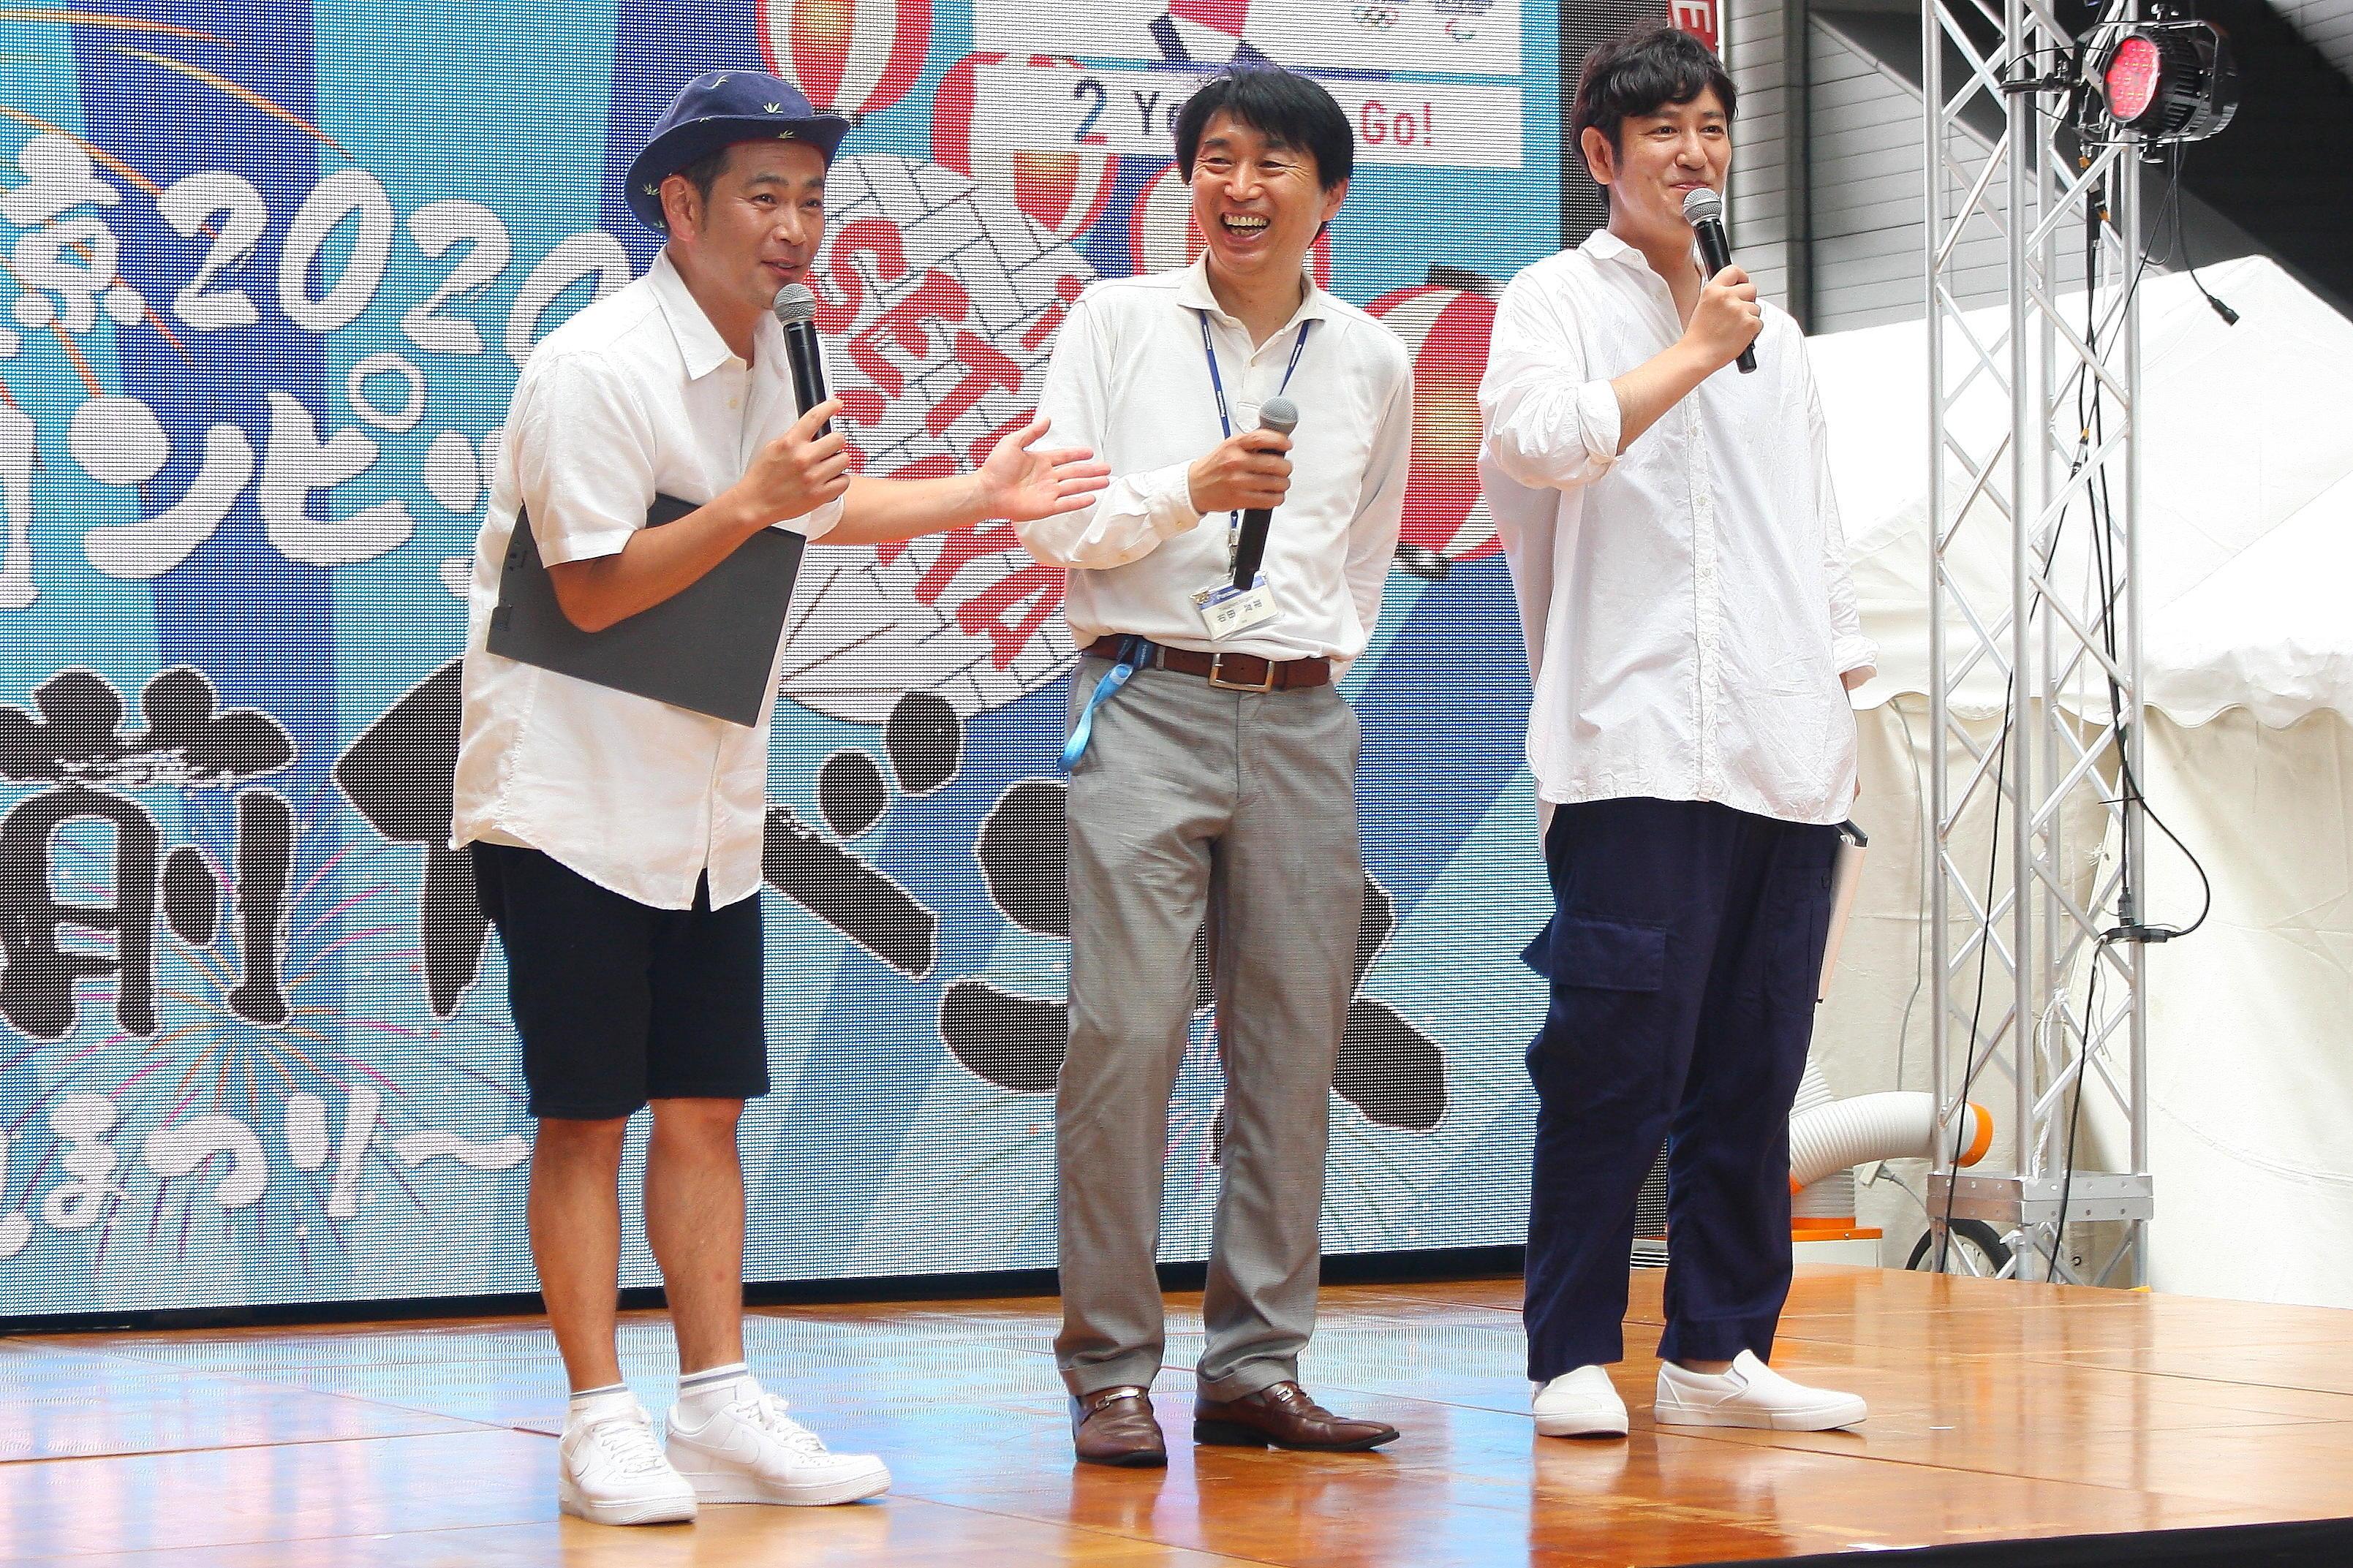 http://news.yoshimoto.co.jp/20180730143308-1f4488e16ee66af9936fd123c061fdaae4270a86.jpg